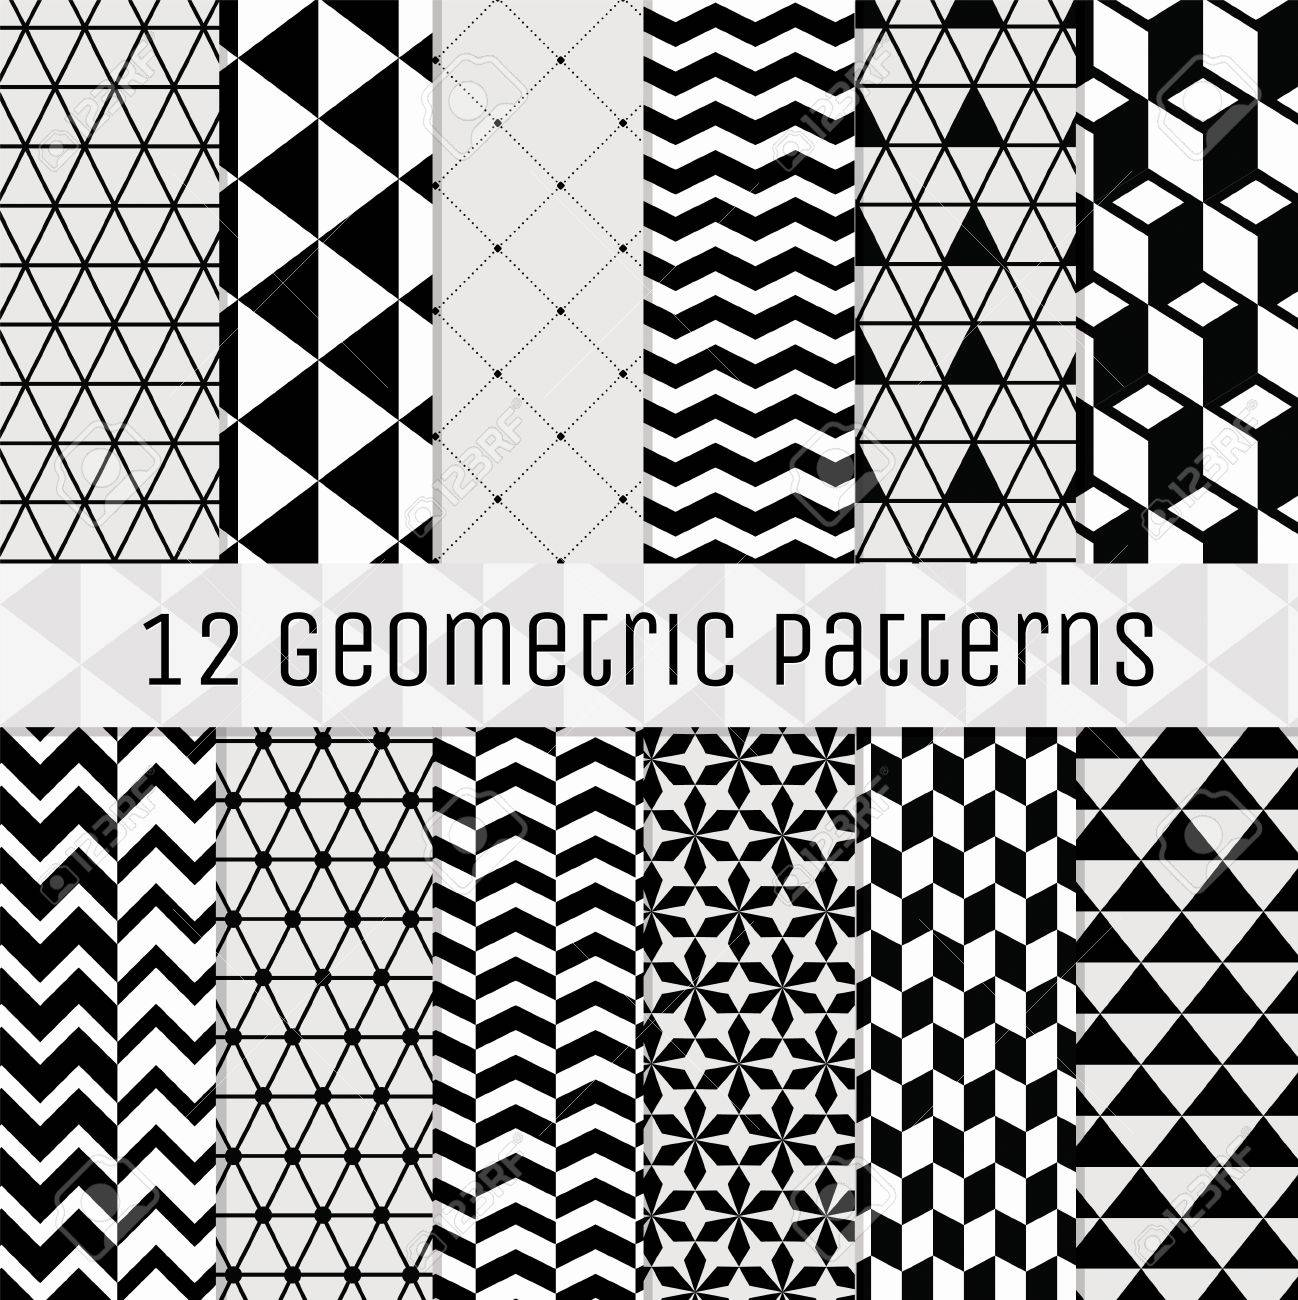 Transparent Patterns Magnificent Design Ideas